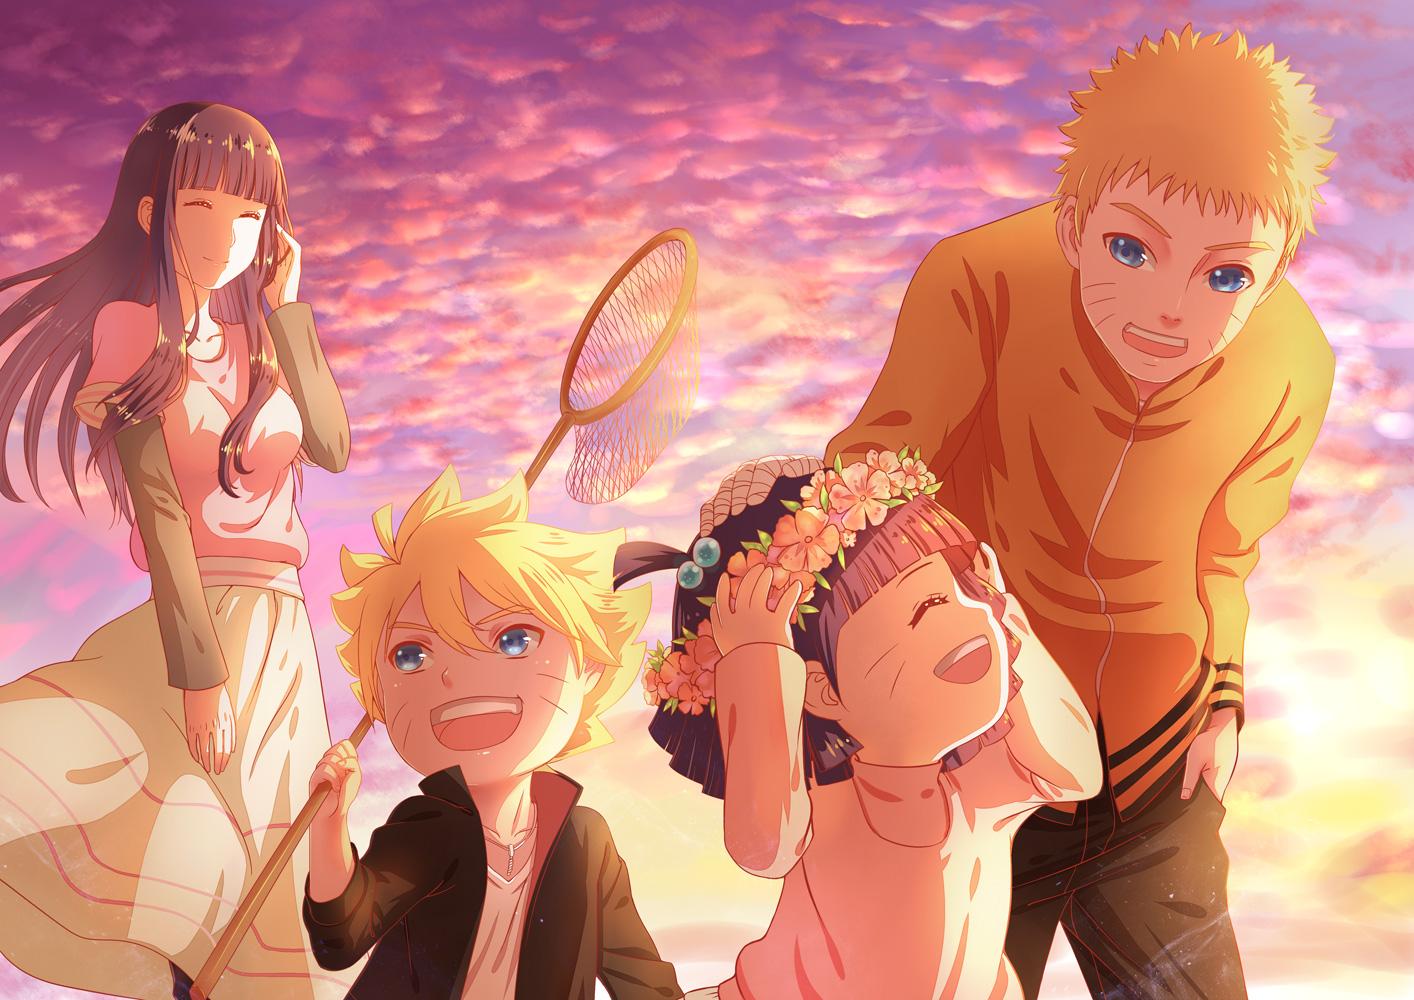 Top-Ten-Pixiv-Artworks-of-the-Week-#2-Naruto-Edition_Haruhichan.com_#4_幸せ③--家に帰って_HaneRu